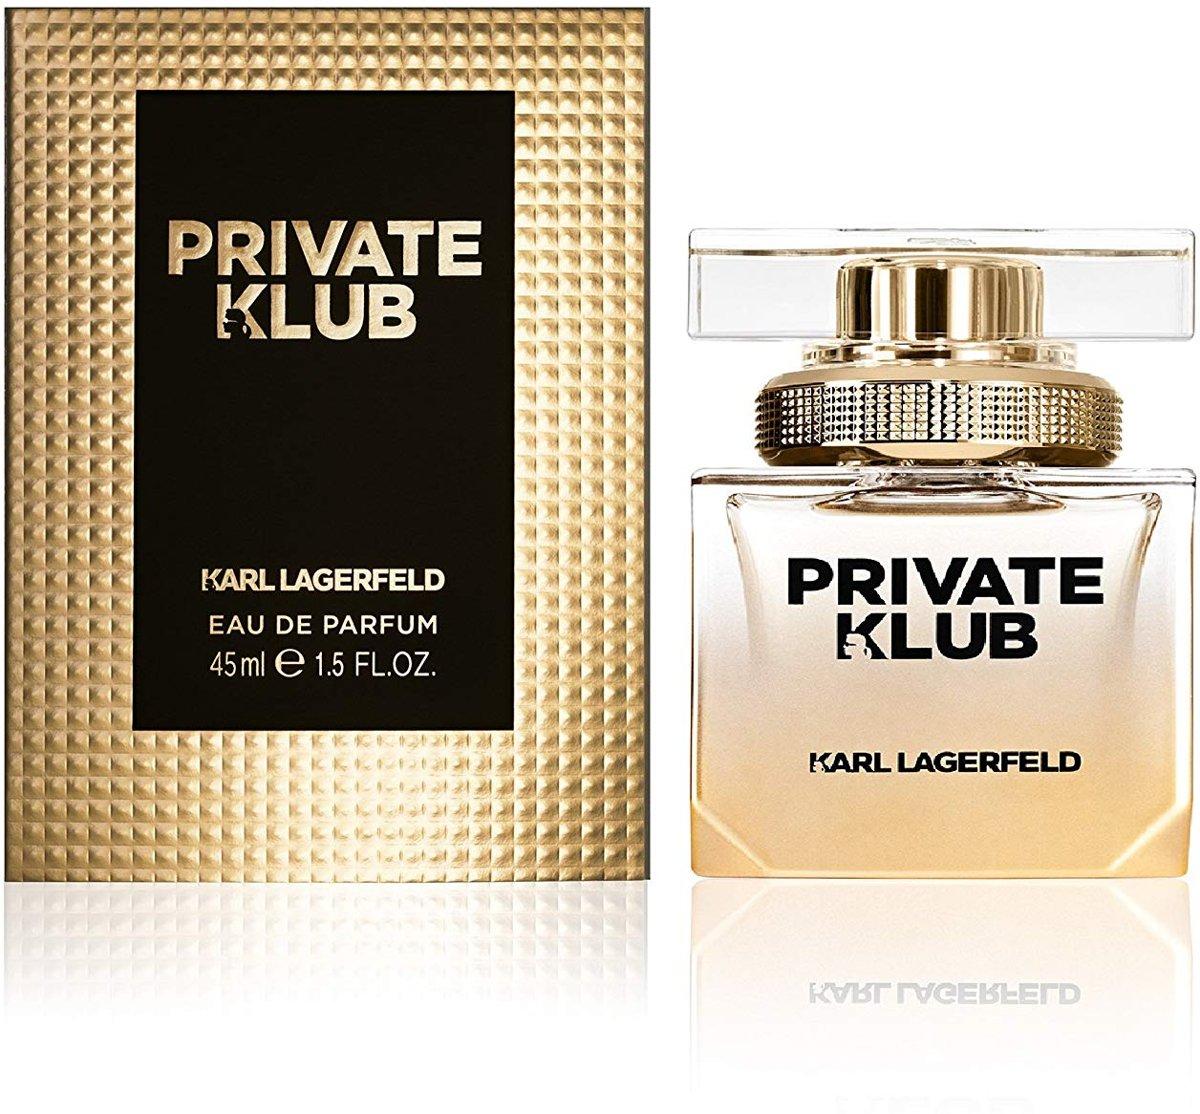 Karl Lagerfeld Private Klub Eau de Parfum Spray 45 ml